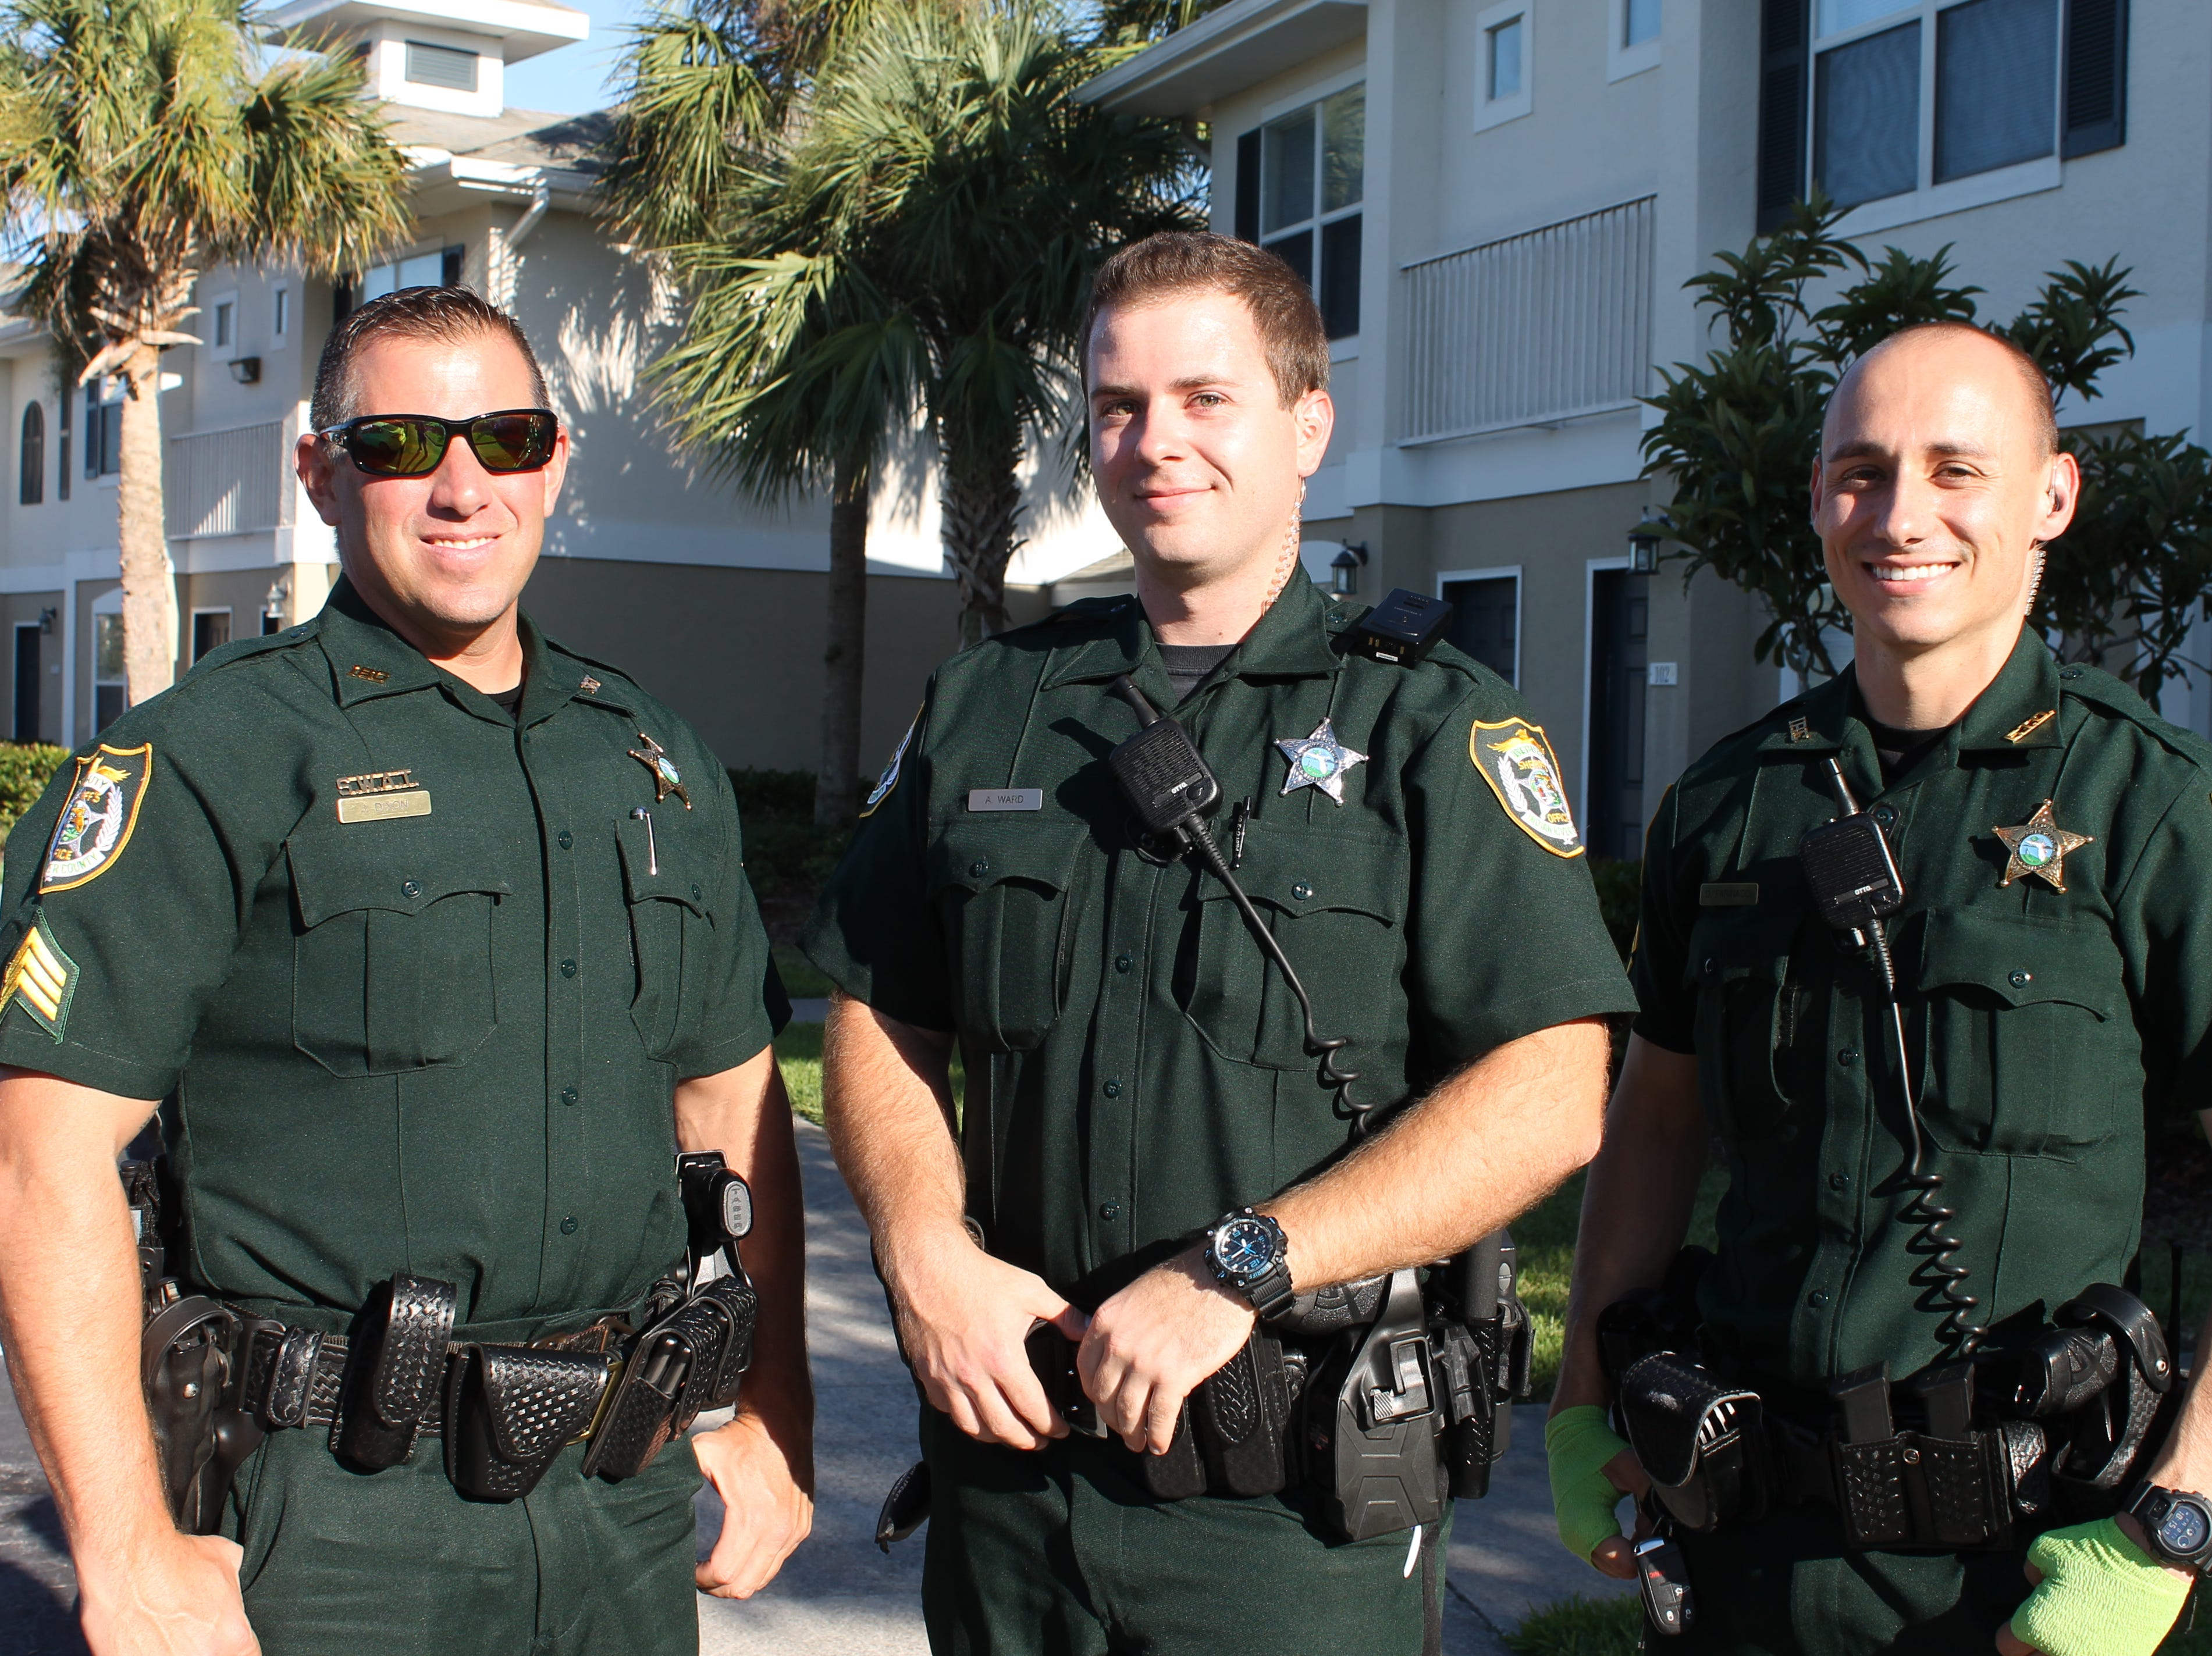 Jim Dixon, Andrew Ward and Dylan Farinacci